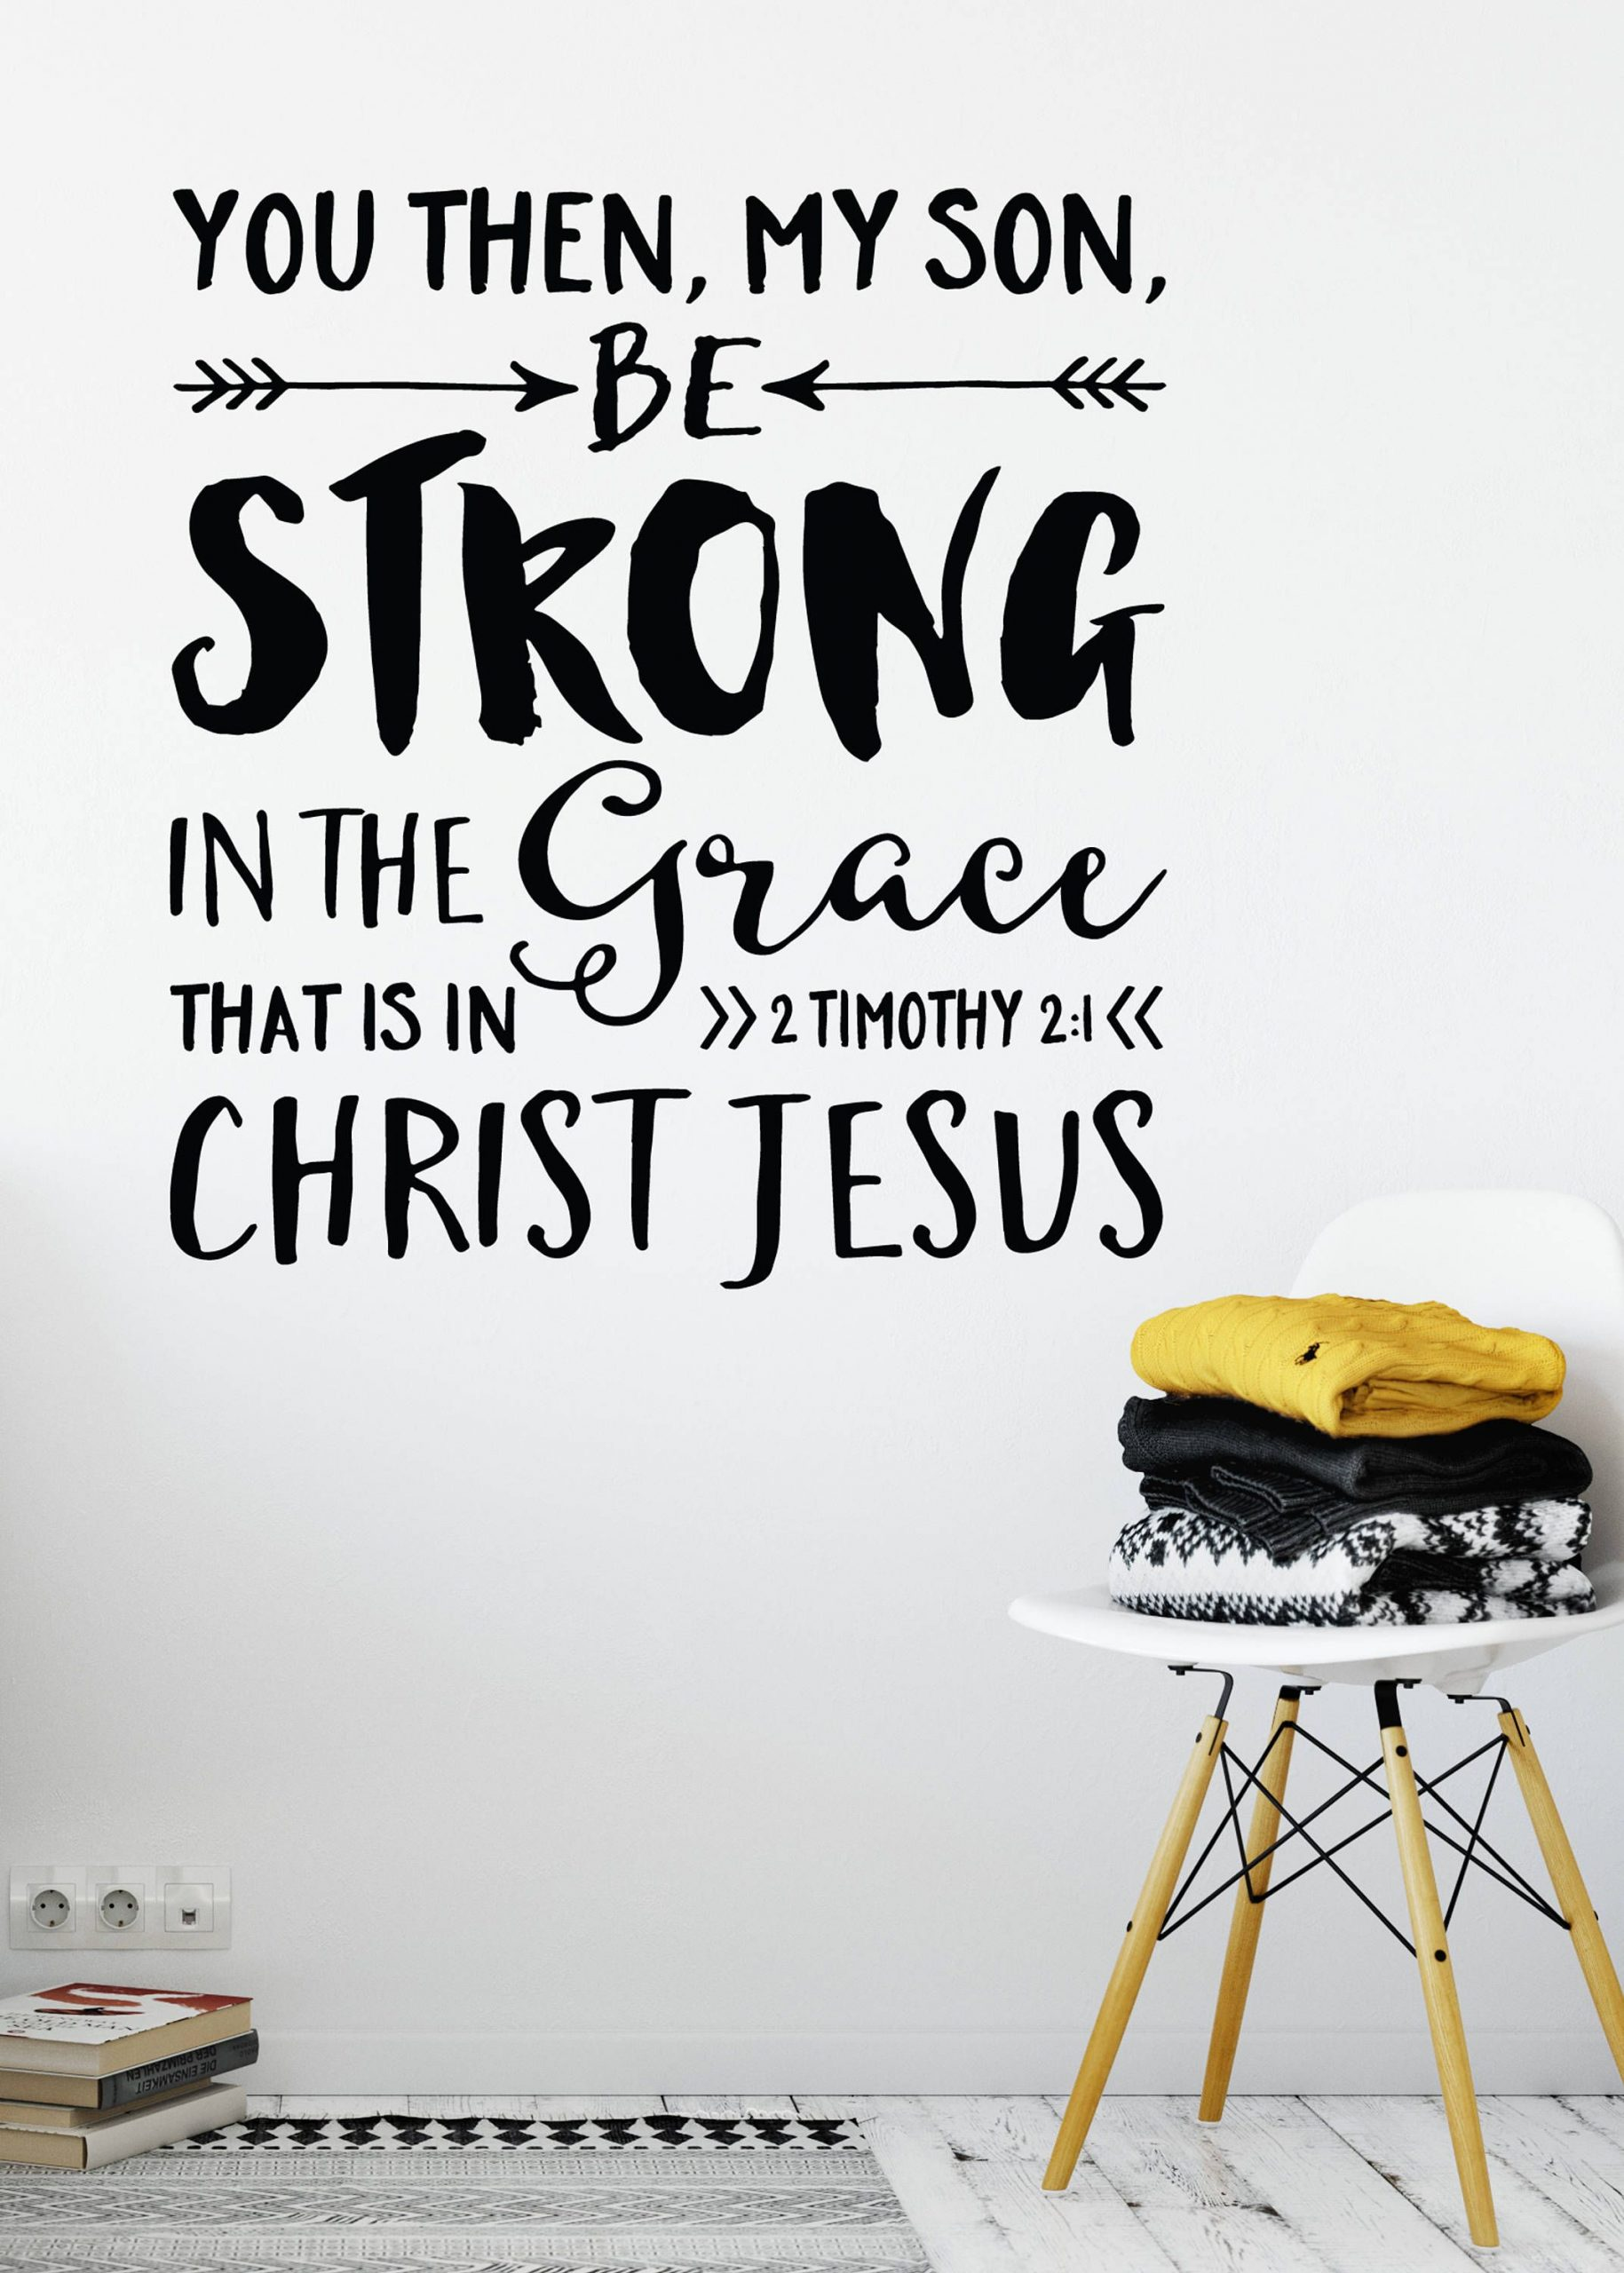 """Keys to Endurance"" – June 13th, Sunday Service"